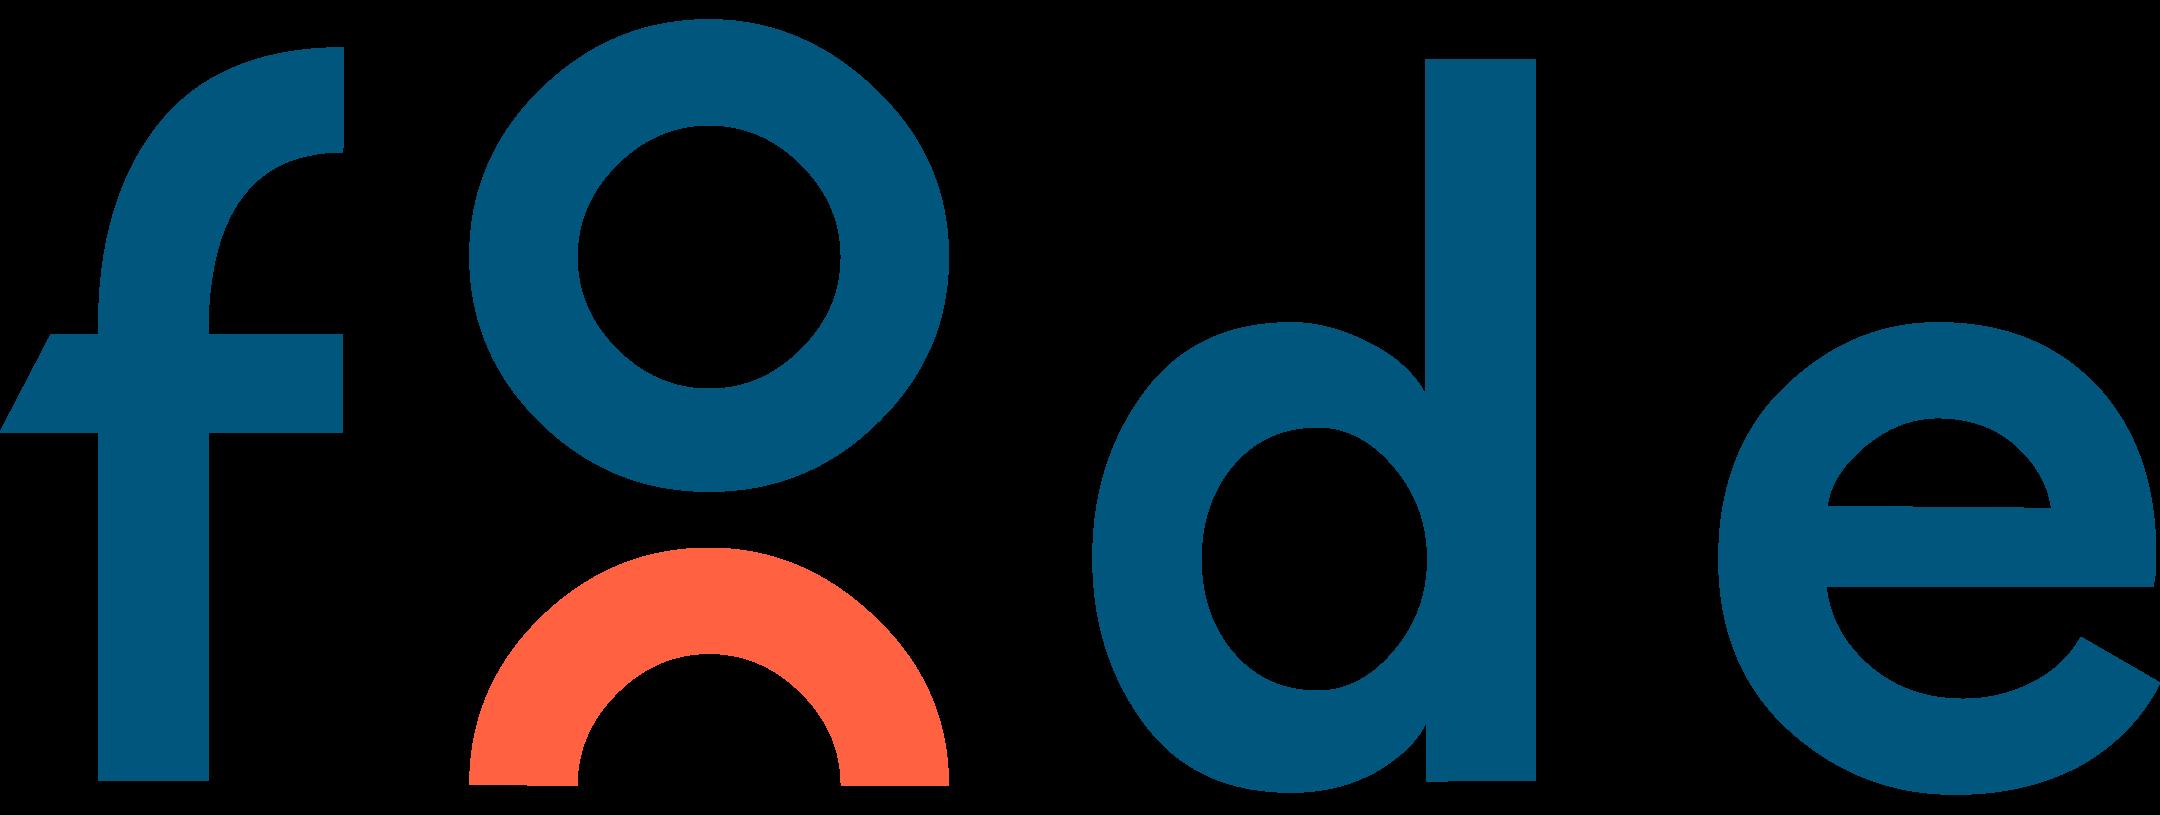 Fode Branding y Diseño Web